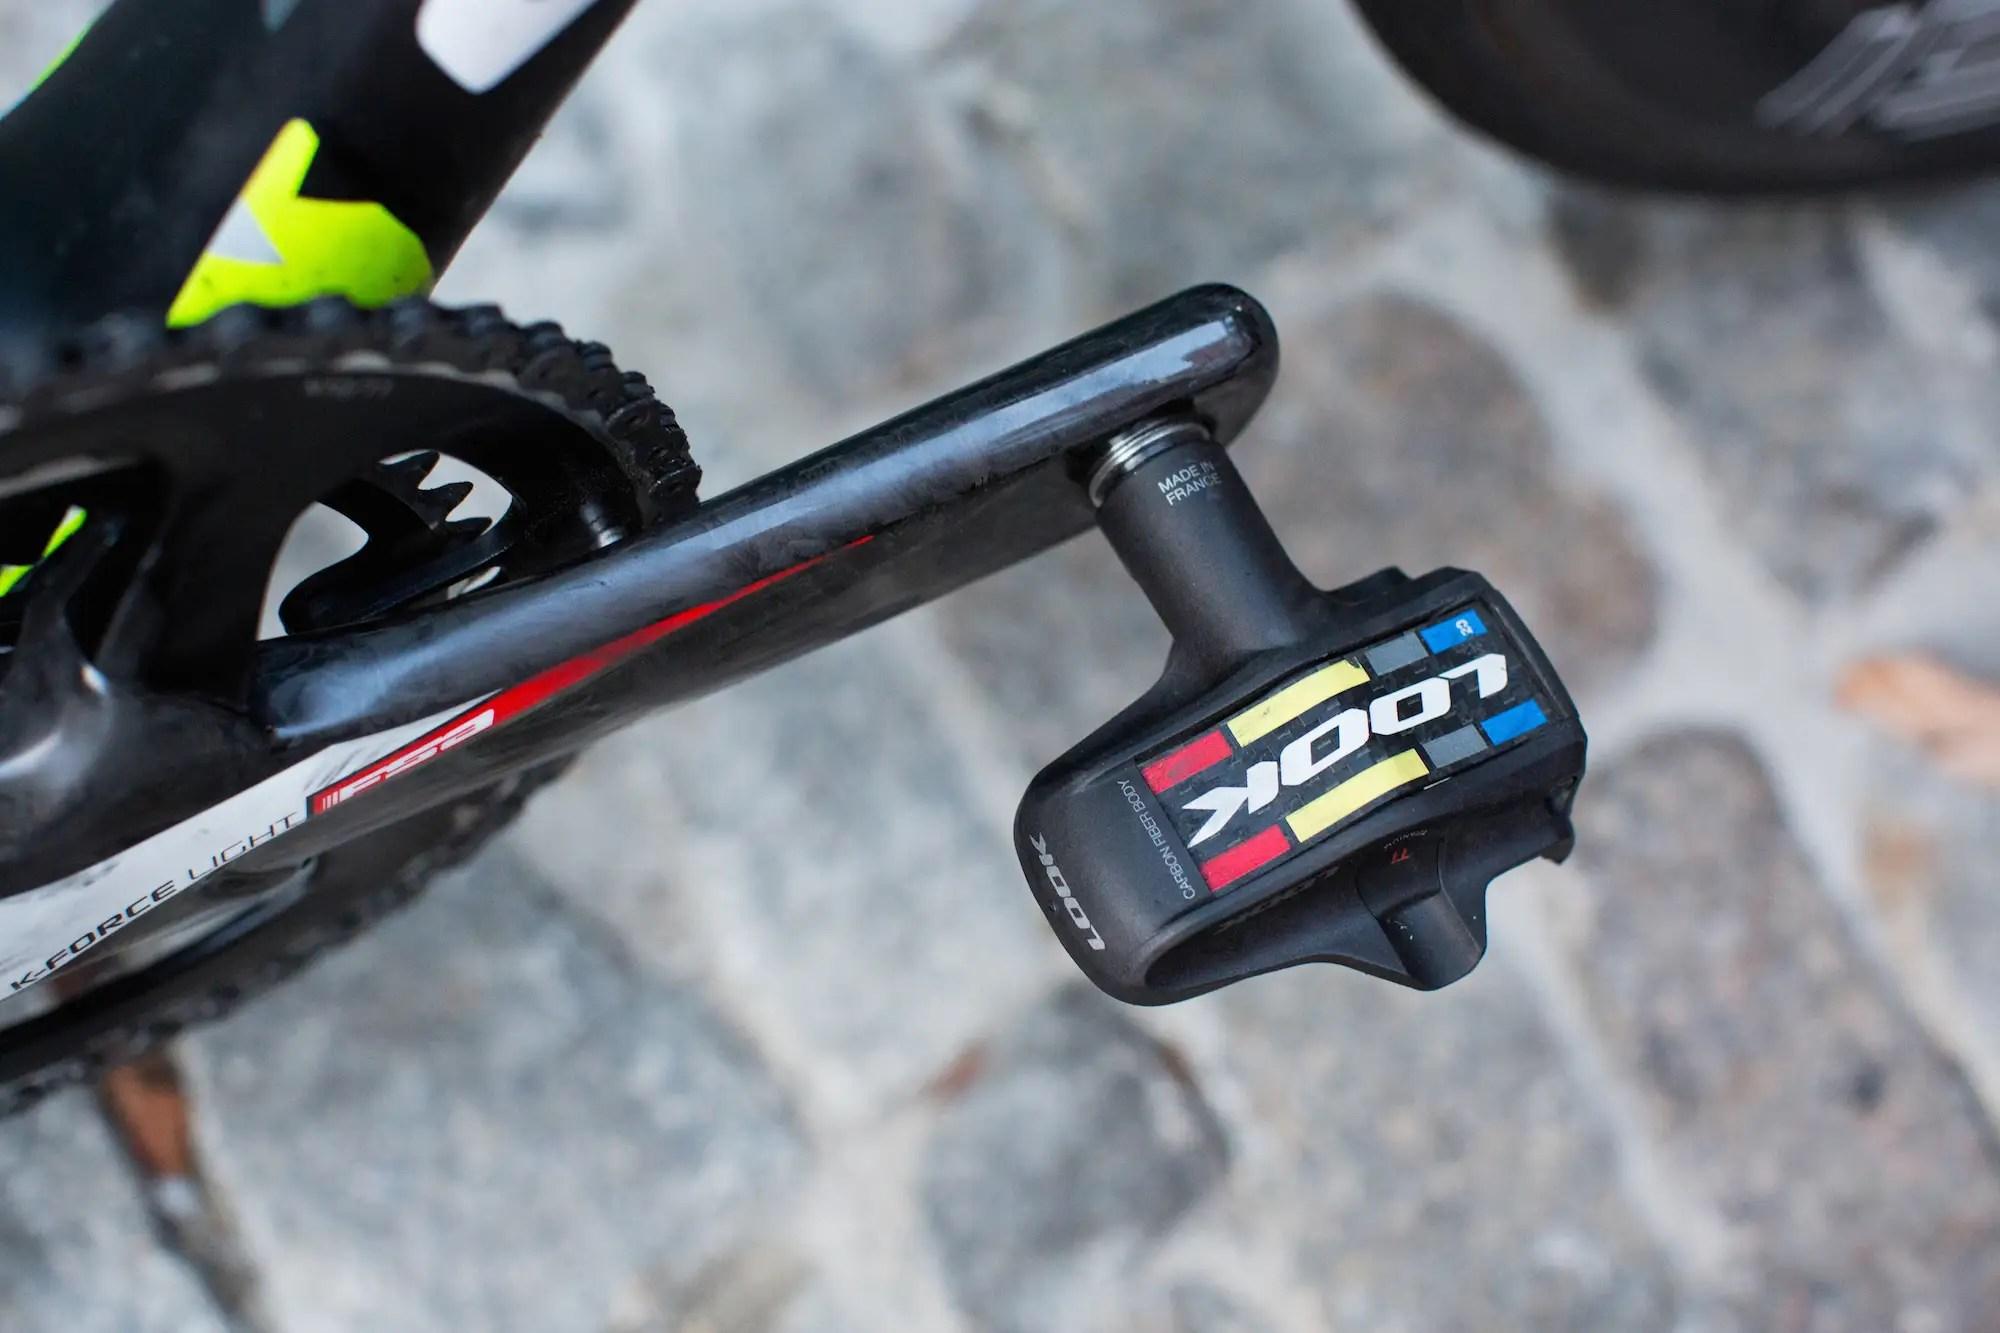 Sagan rides Look KeO Blade clipless pedals.